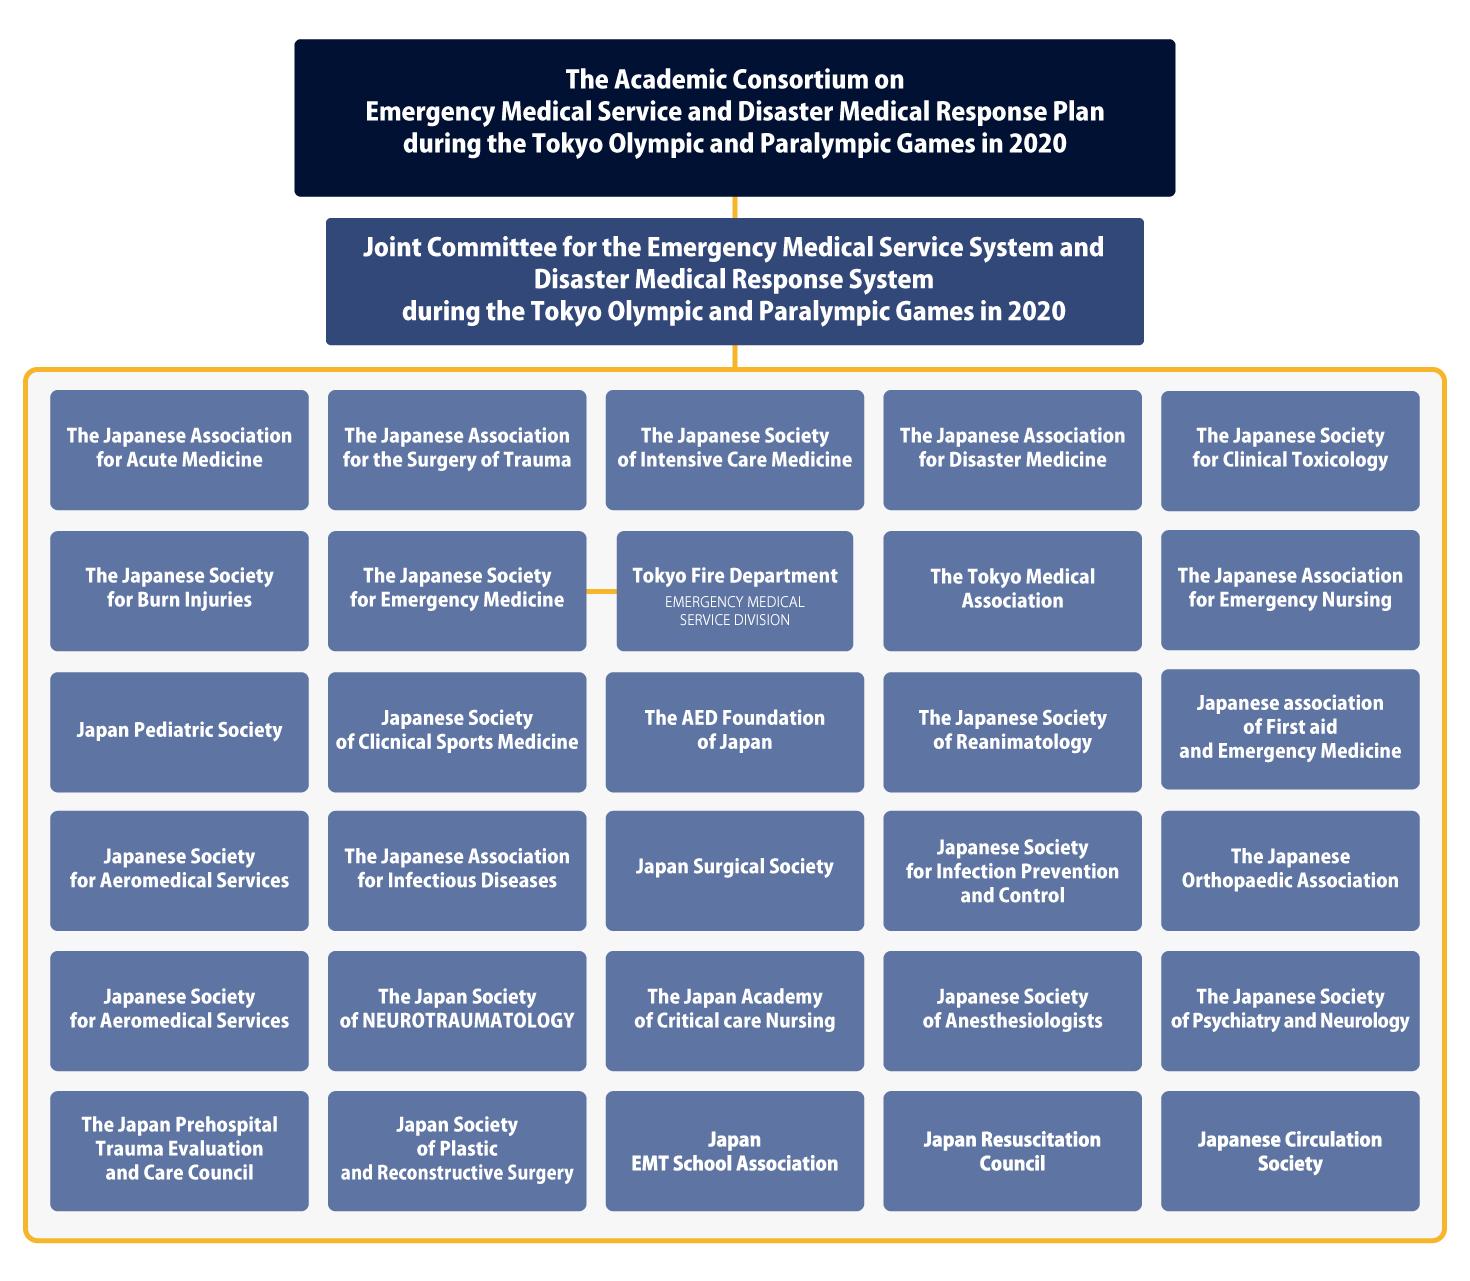 Consortium   The Academic Consortium on Emergency Medical